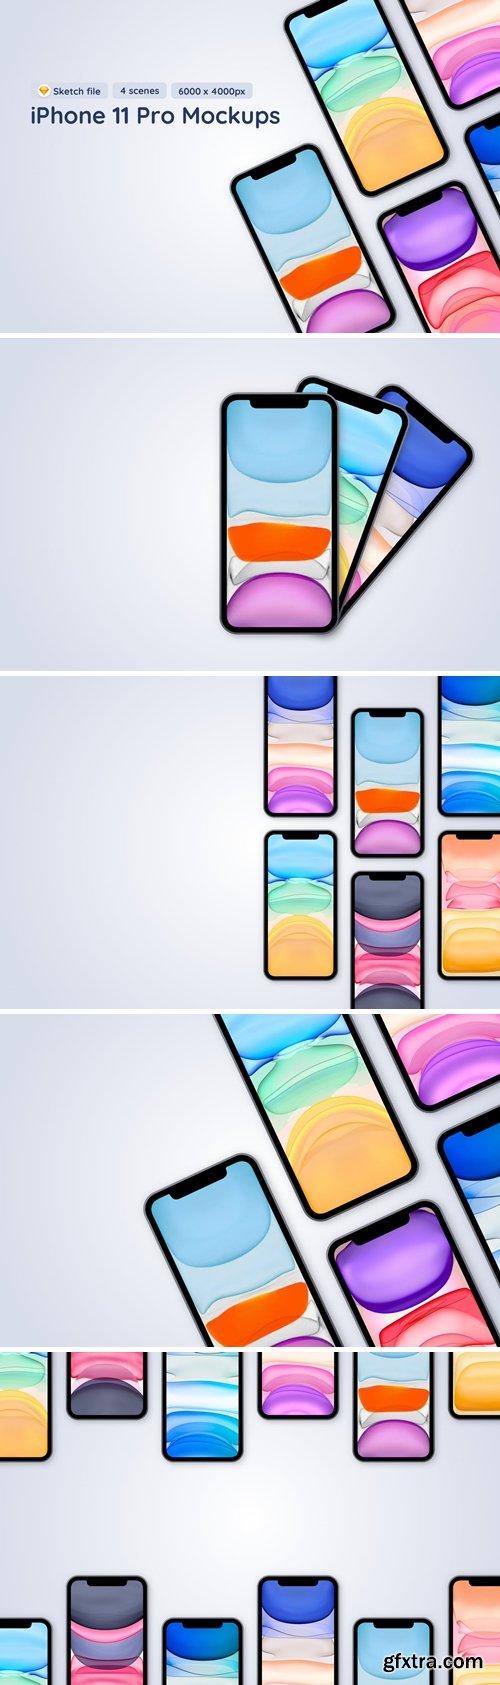 iPhone 12 Pro - Sketch Mockup - 4 different scenes